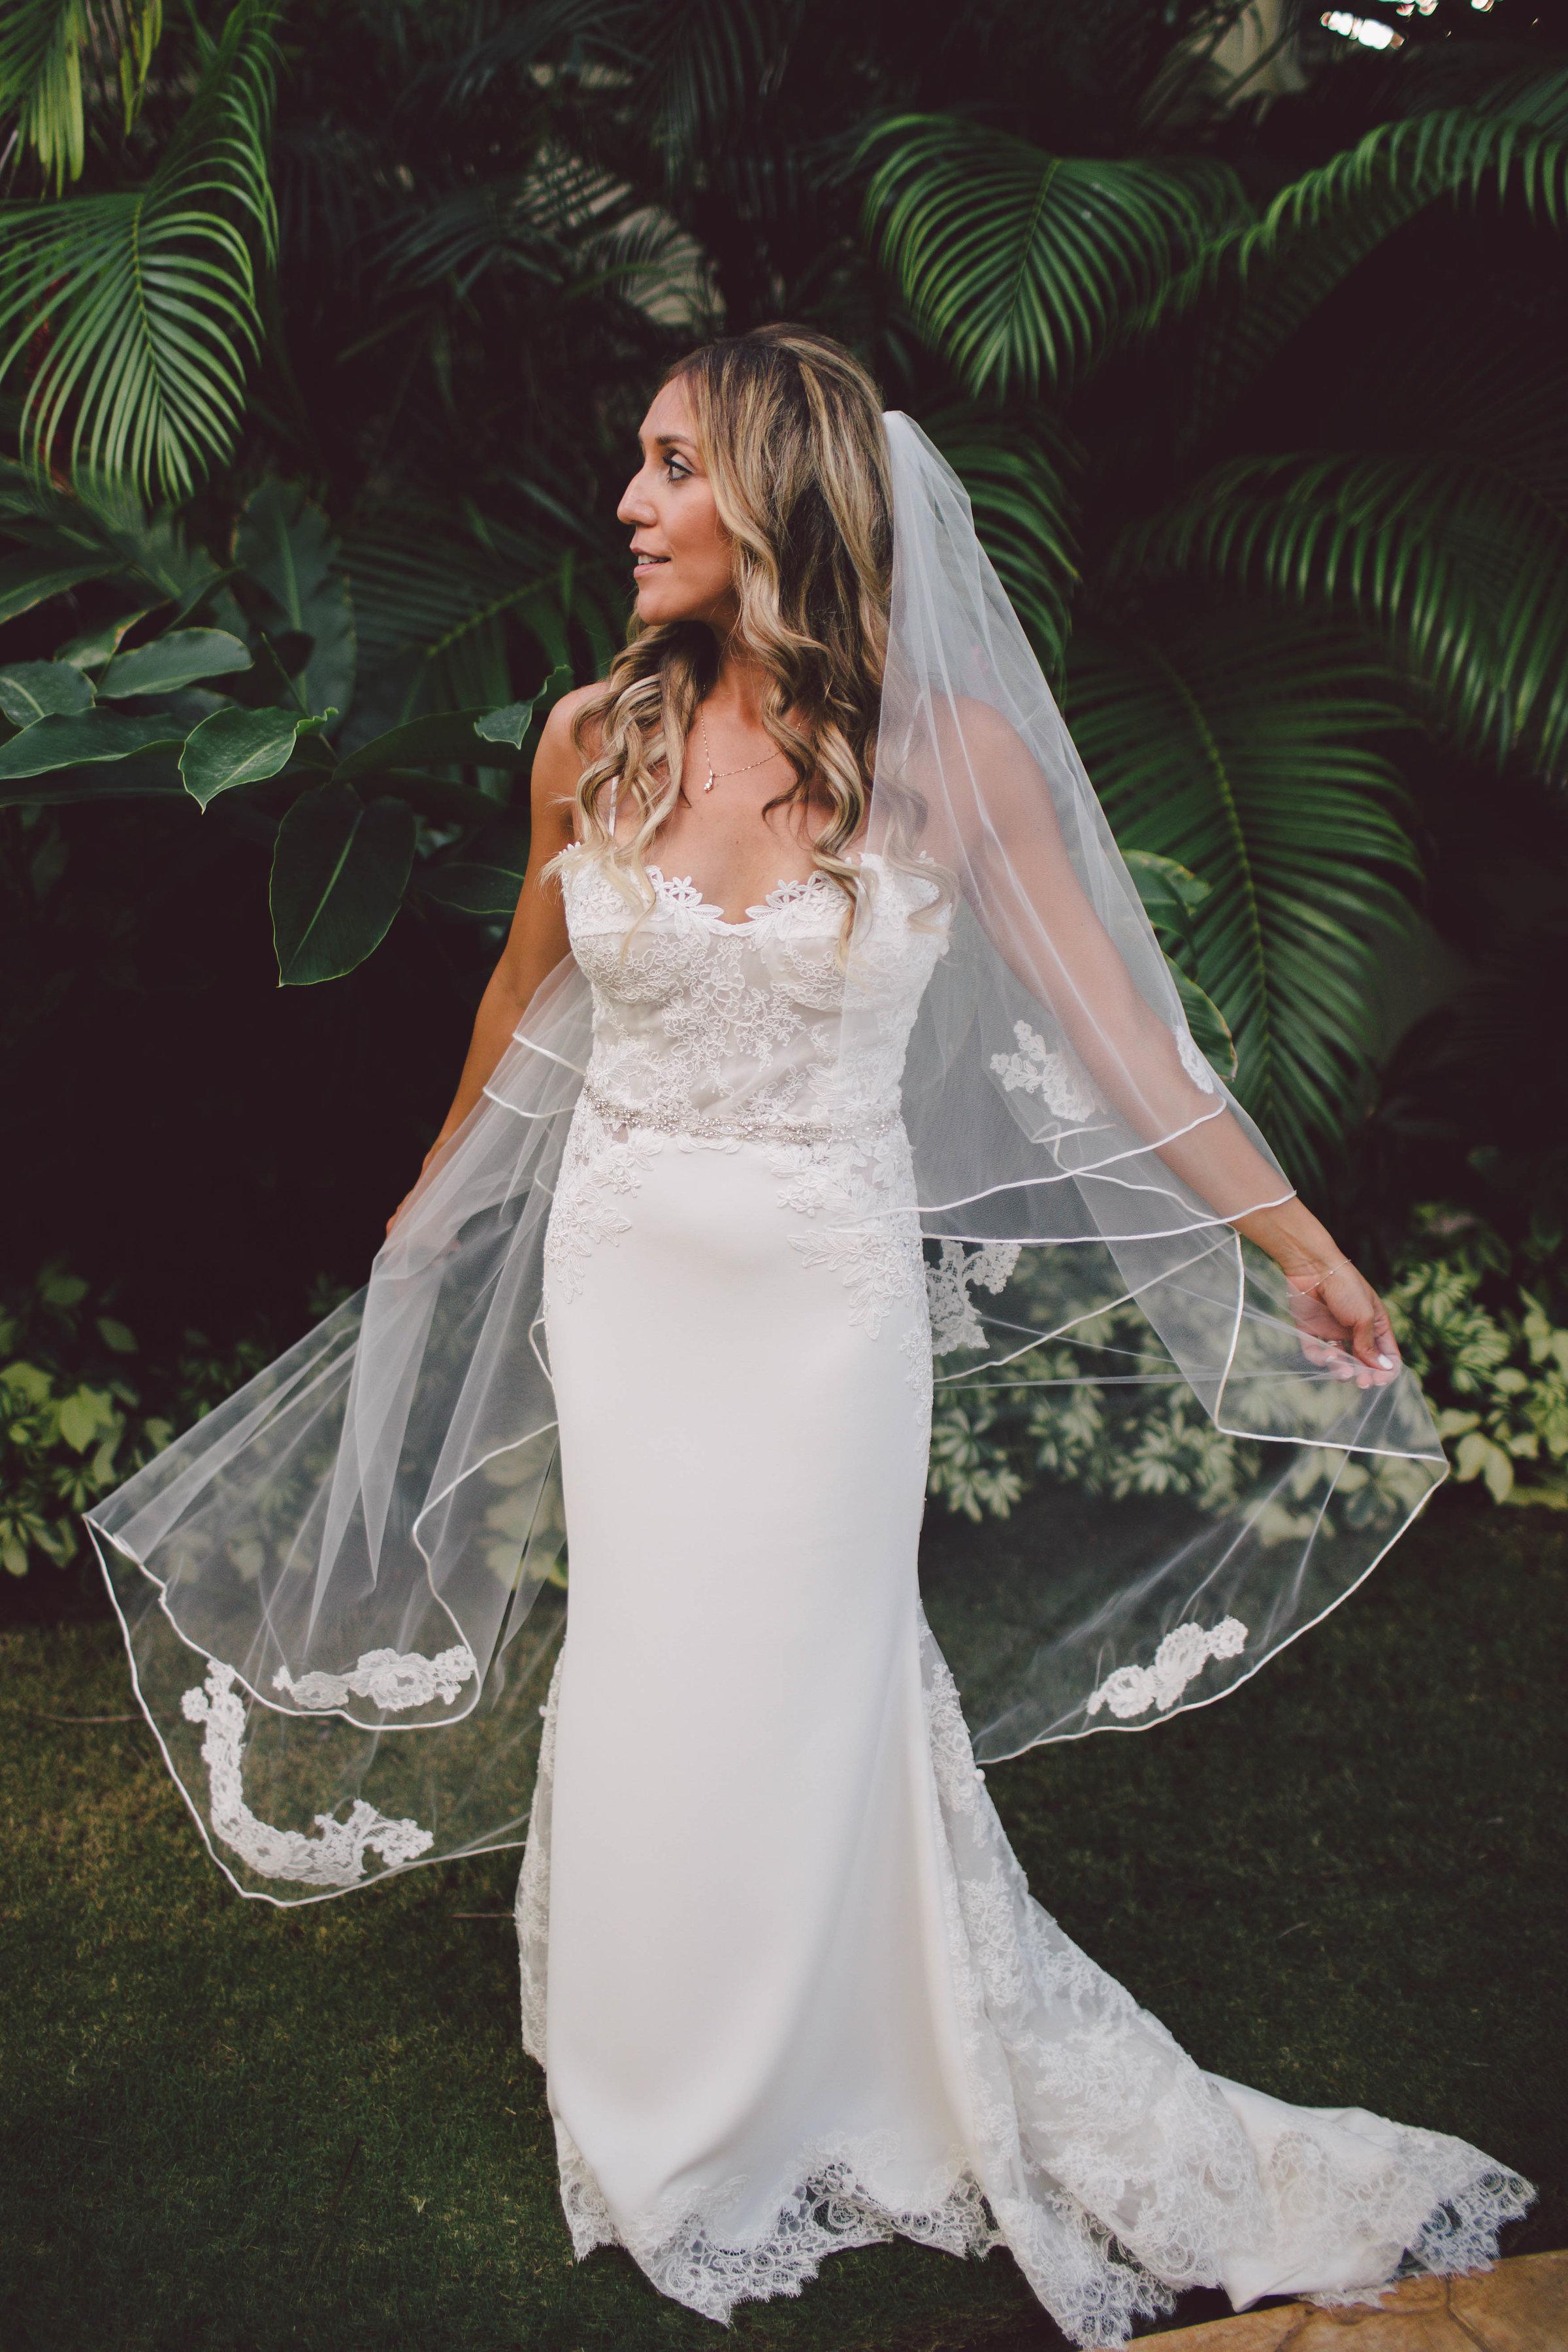 mexico_wedding_cancun_villa_la_joya_evangeline_lane_099.jpg